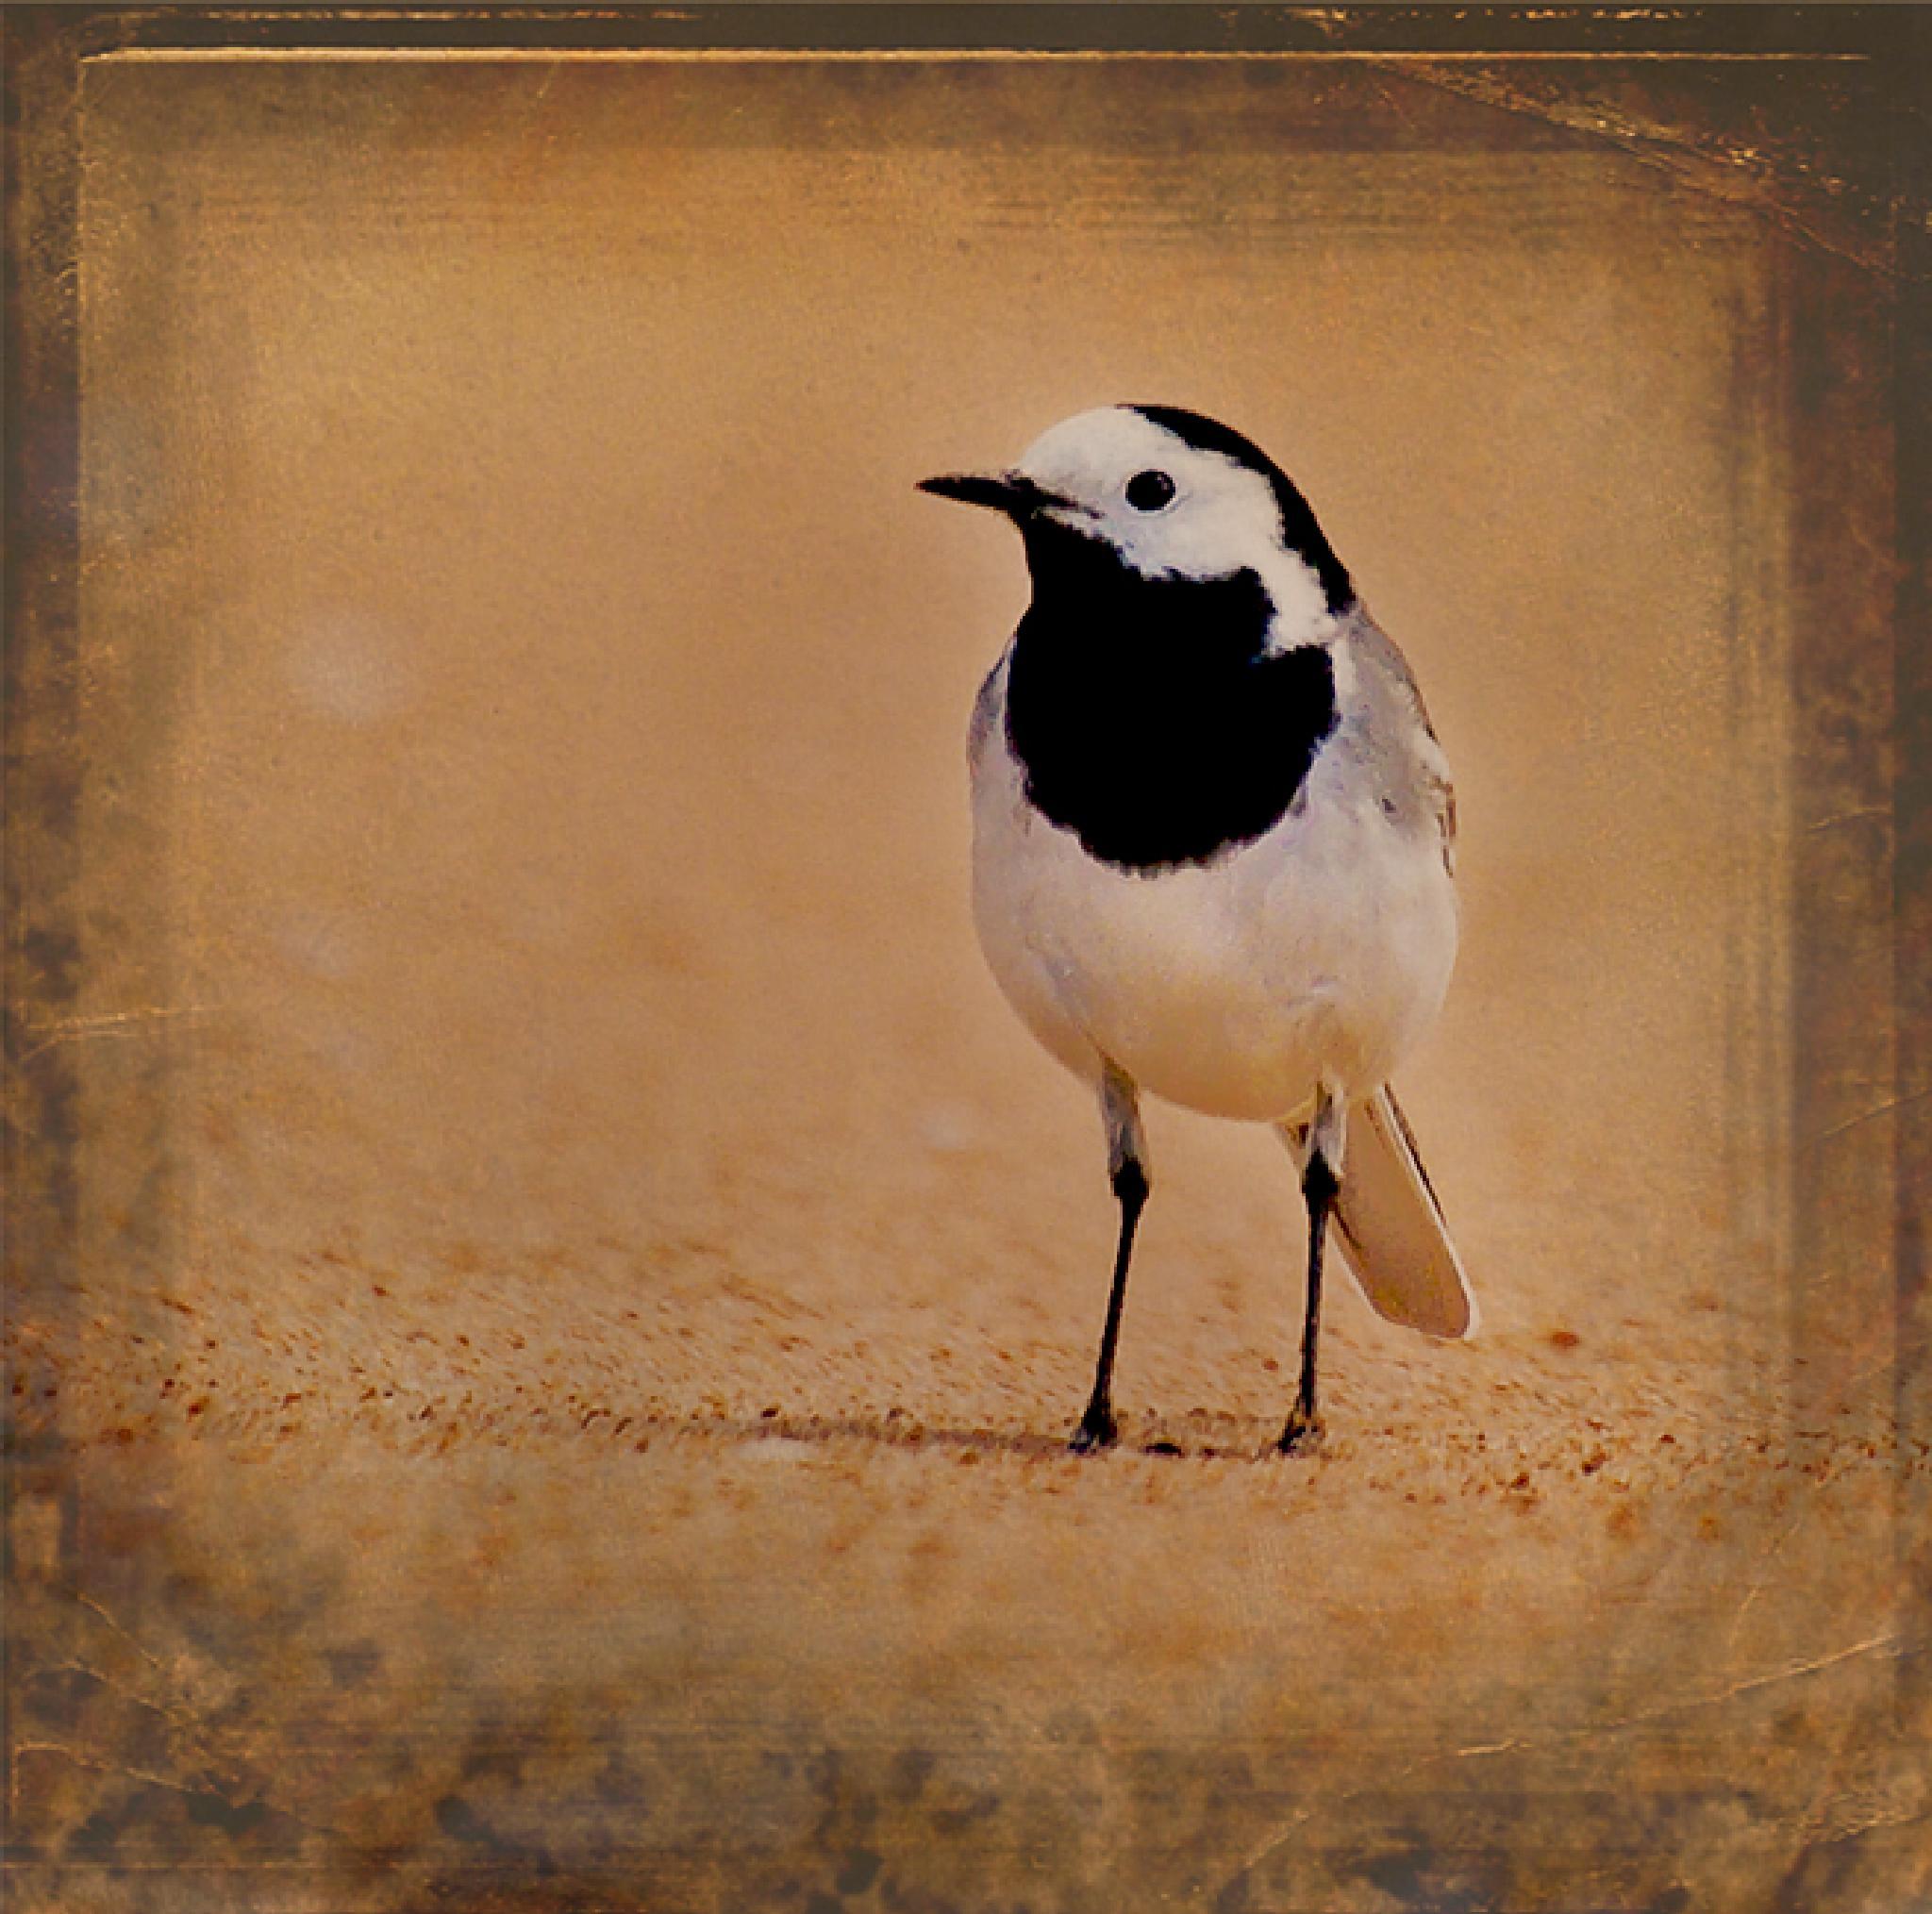 Bird on the beach by Peter Samuelsson